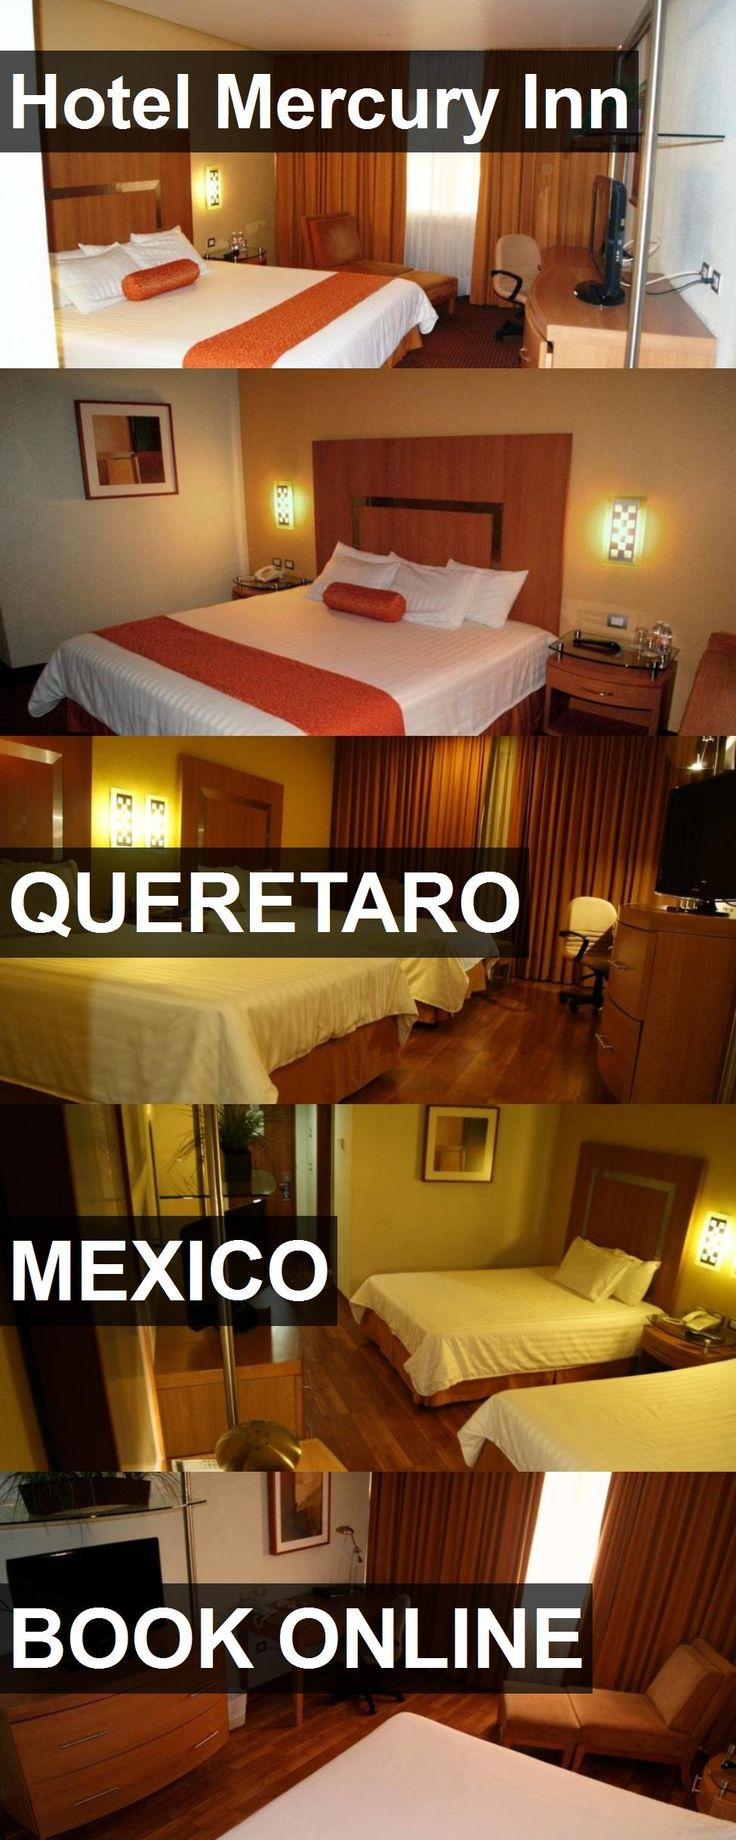 Hotel Hotel Mercury Inn in Queretaro, Mexico. For more information, photos, reviews and best prices please follow the link. #Mexico #Queretaro #HotelMercuryInn #hotel #travel #vacation